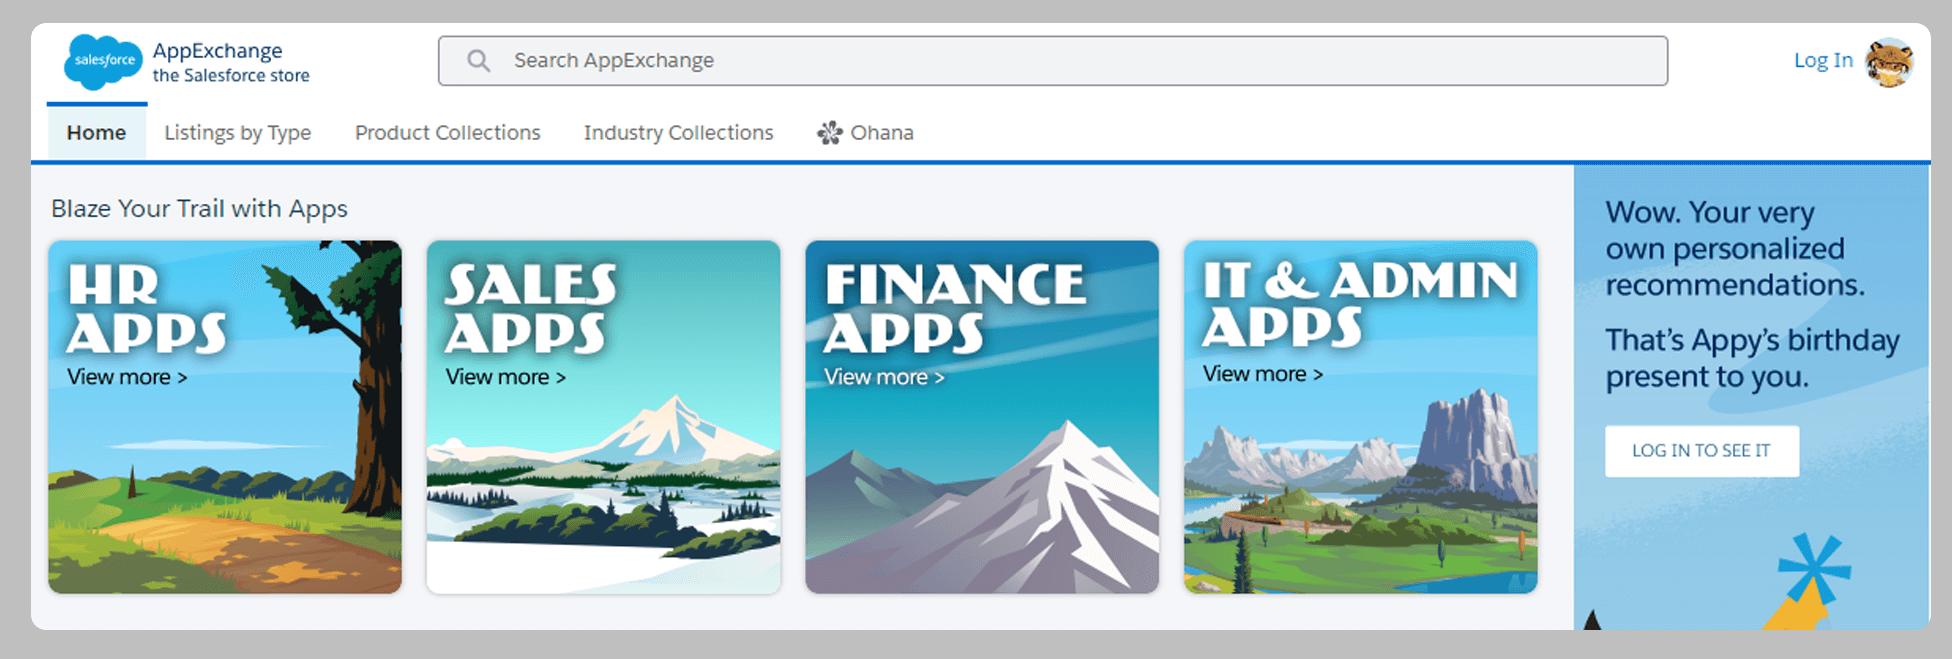 Salesforce App Categories on AppExchange